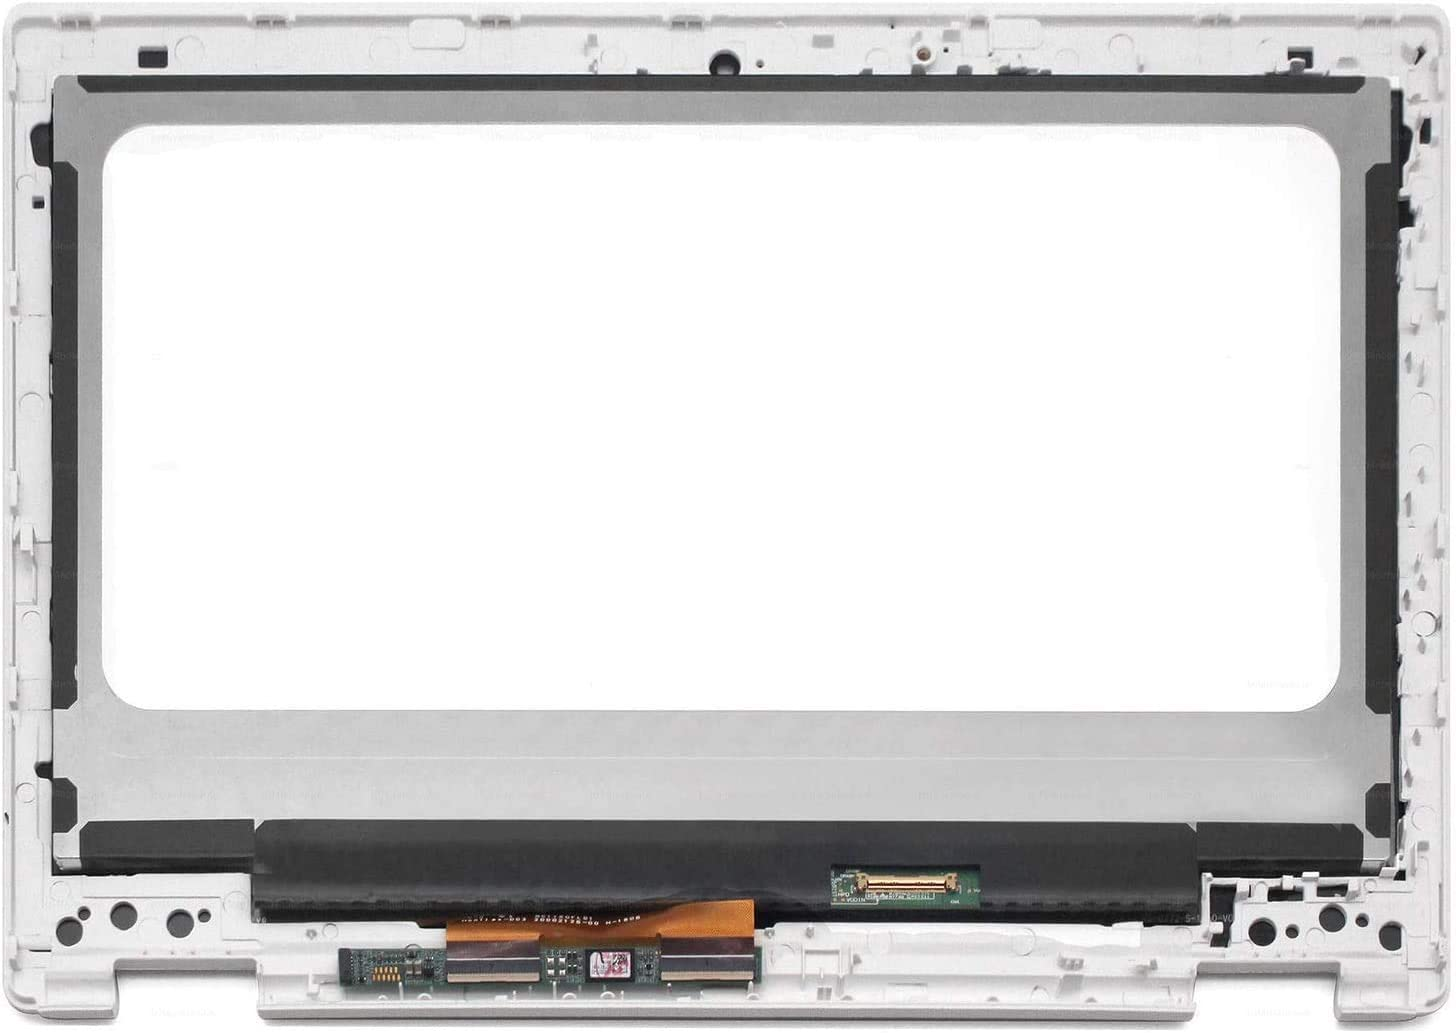 LCD Touchscreen Display Assembly + Bezel for Acer Chromebook R11 CB5-132T N15Q8 White